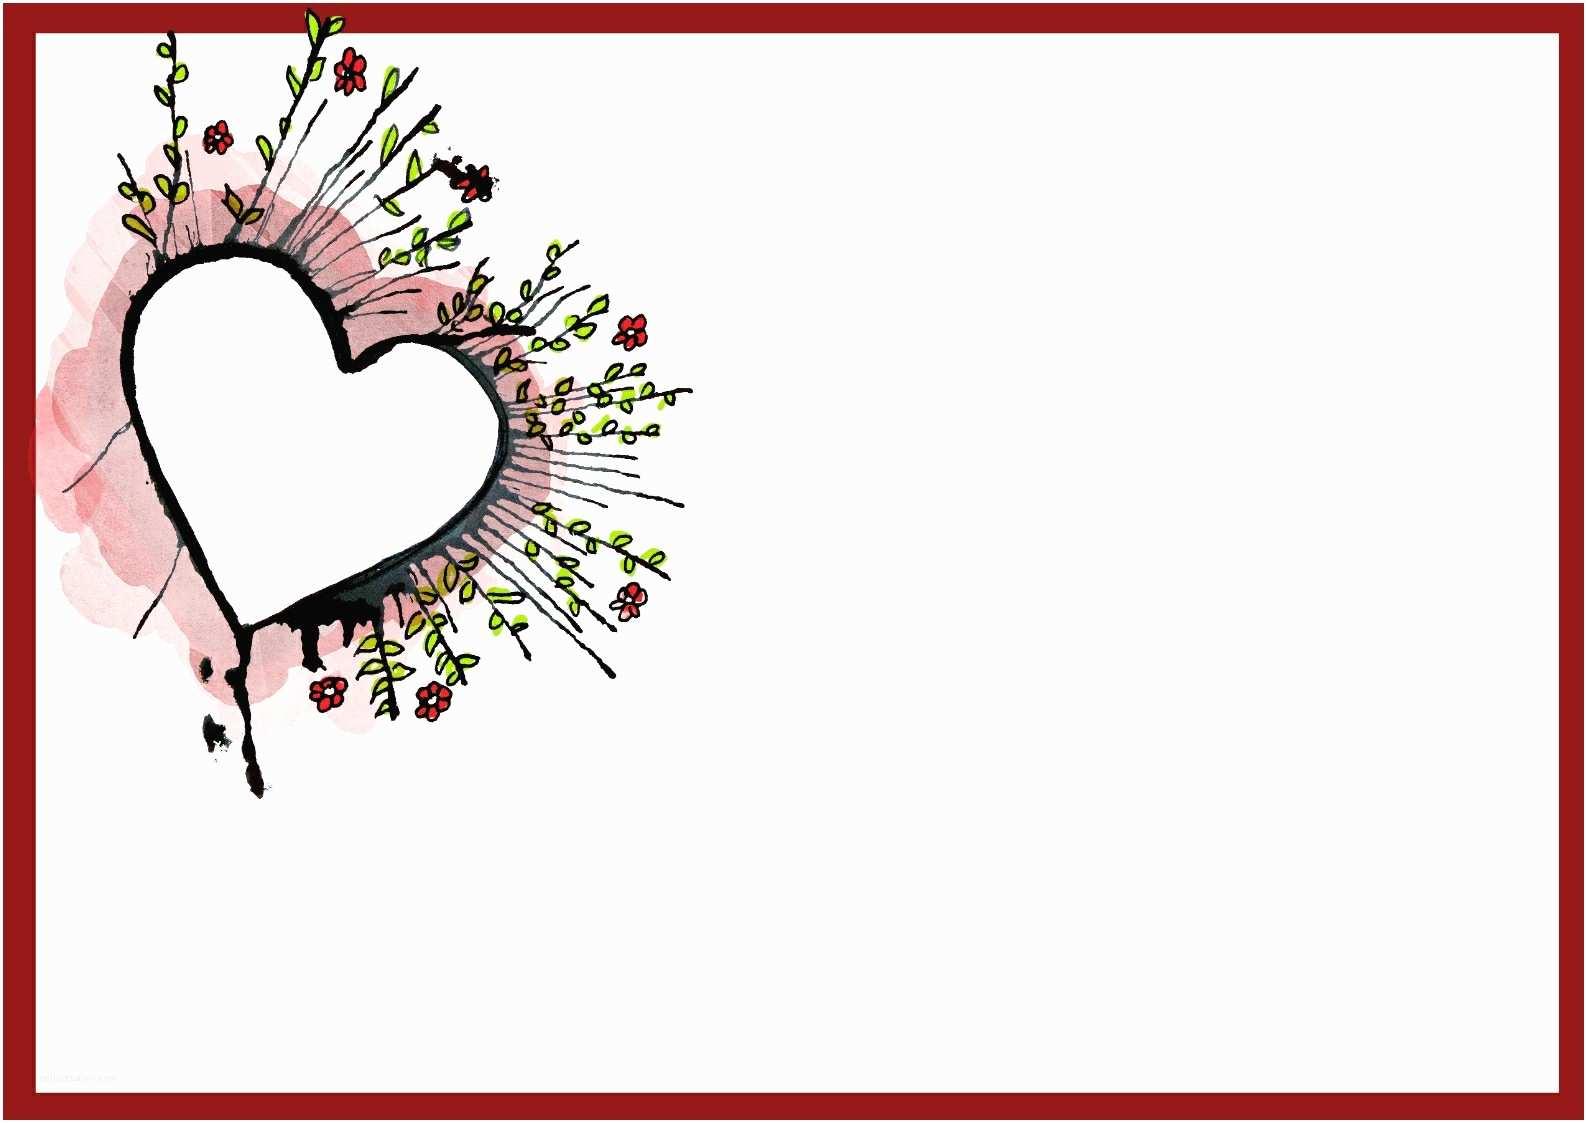 Blank Wedding Invitation Templates Blank and Plain Wedding Invitation Cards for Editing